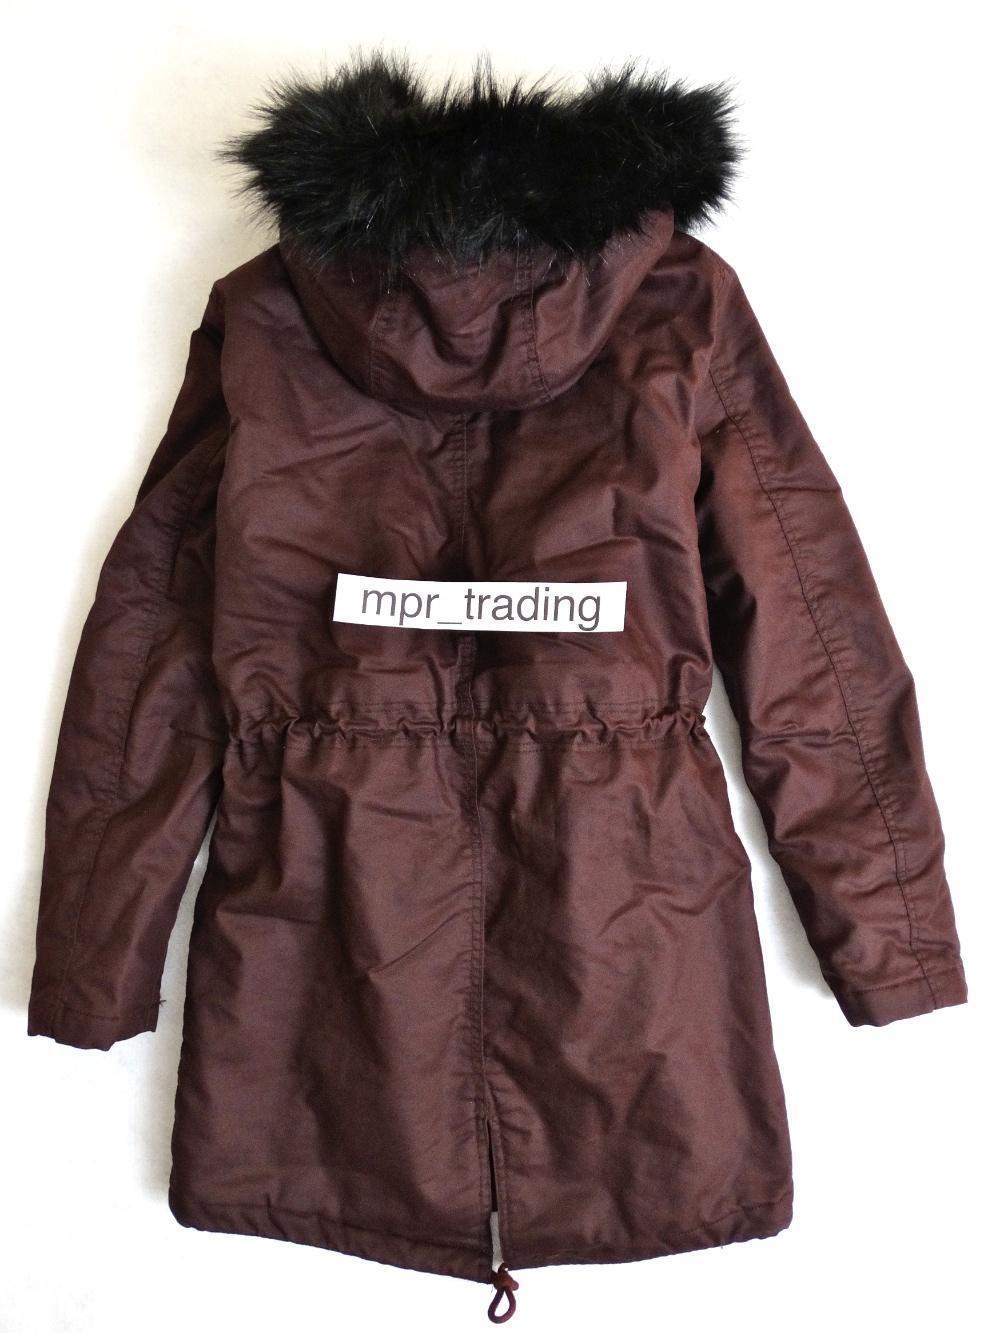 Sik Silk Navy Shiny Puff Parka Jacket SS-15038 RRP £109.95